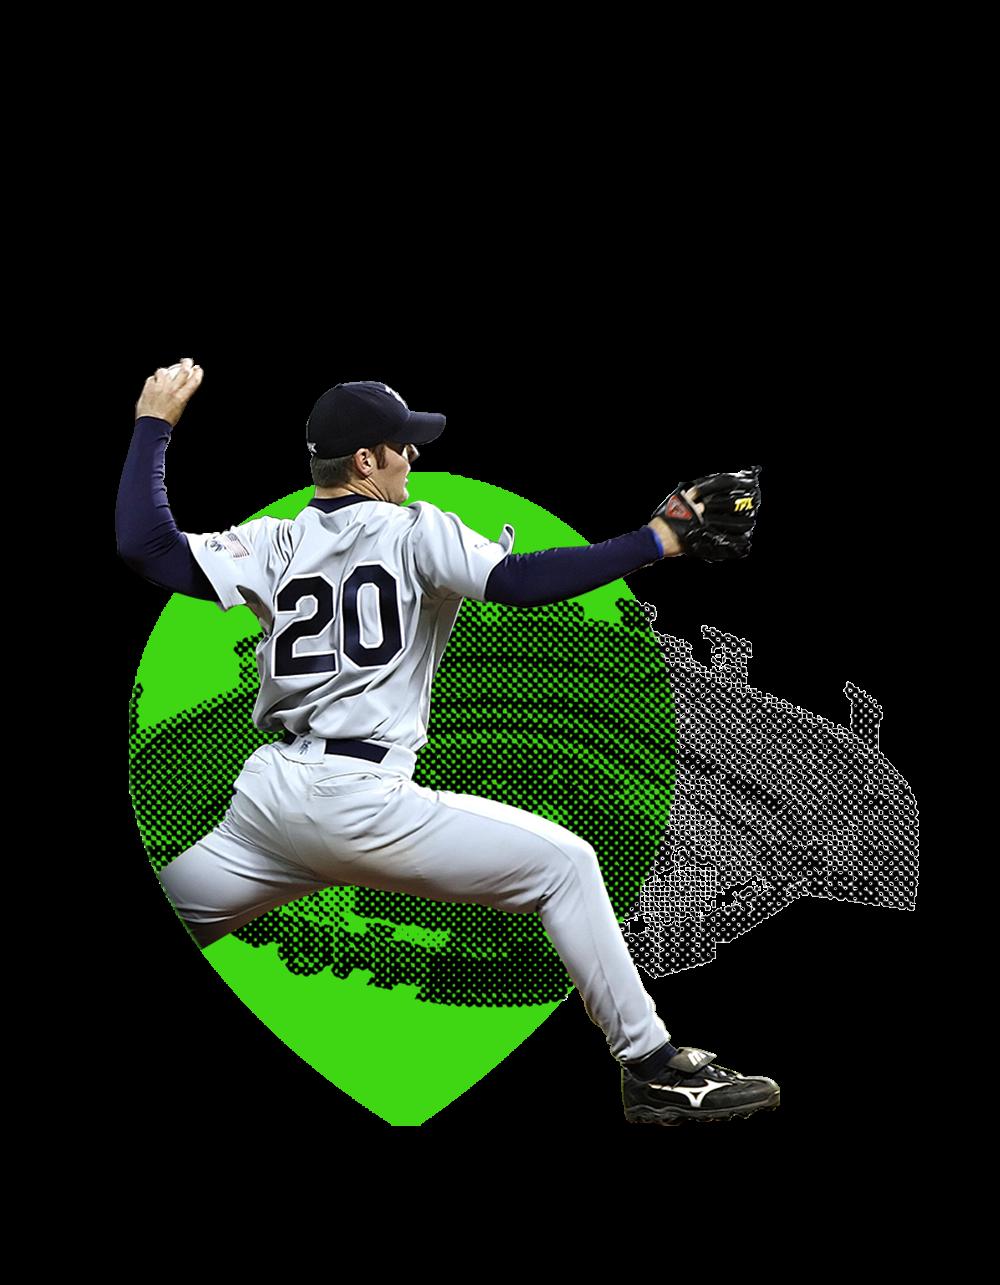 Reserve Baseball Parking - MLB Season